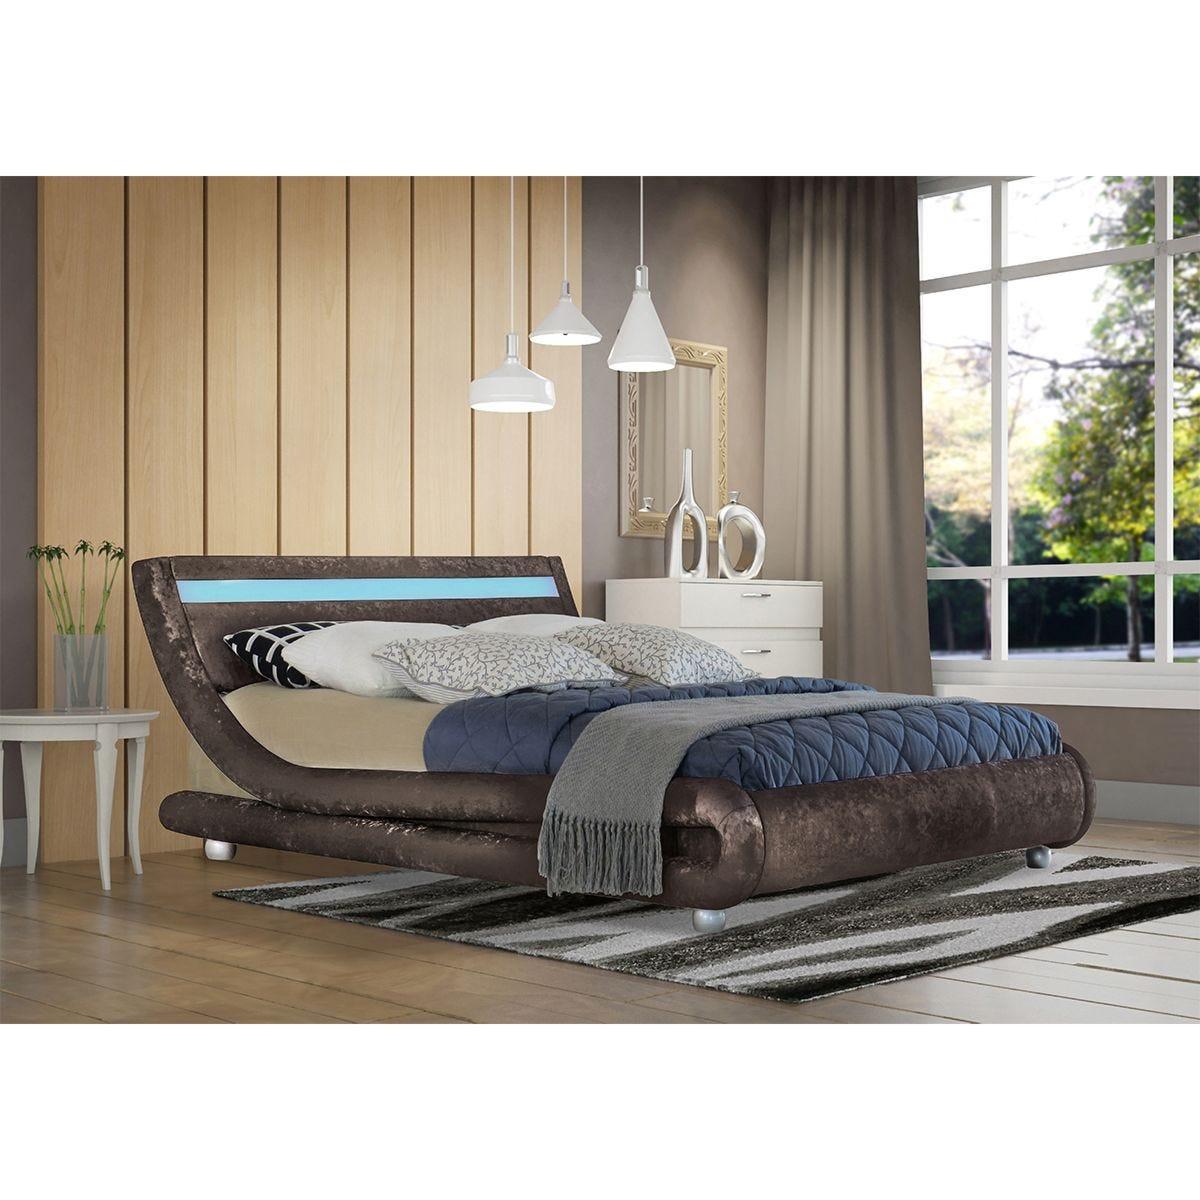 Elias LED Bed Frame - Brown